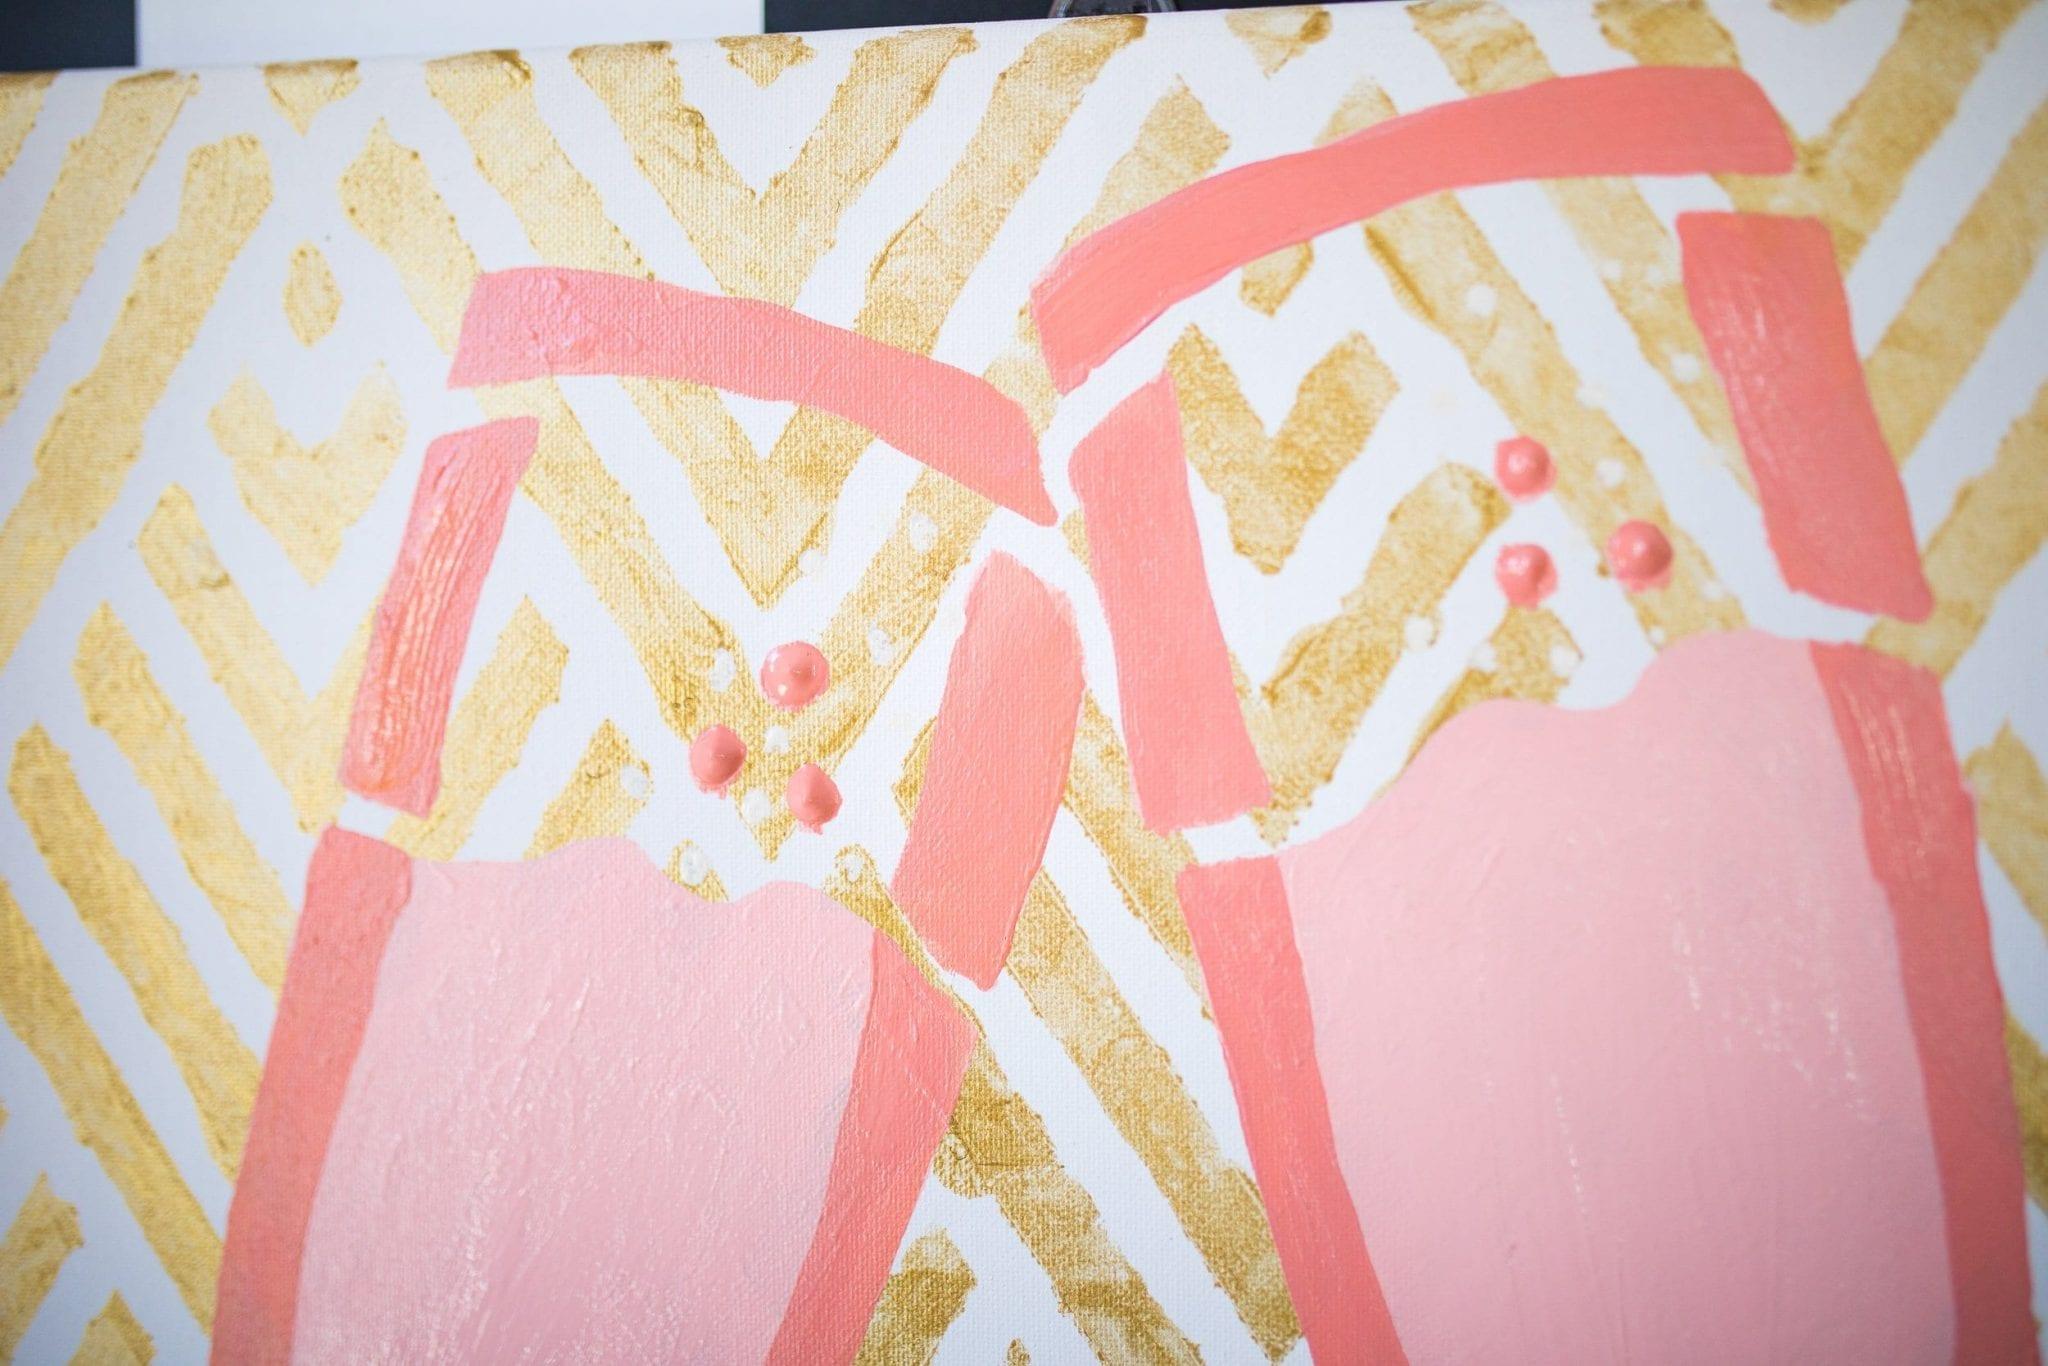 wall decor diy | Canvas DIY | diy canvas wall art stencil | cheers wall decor | super fun office decor | Never Skip Brunch by Cara Newhart | #decor #diy #canvas #neverskipbrunch